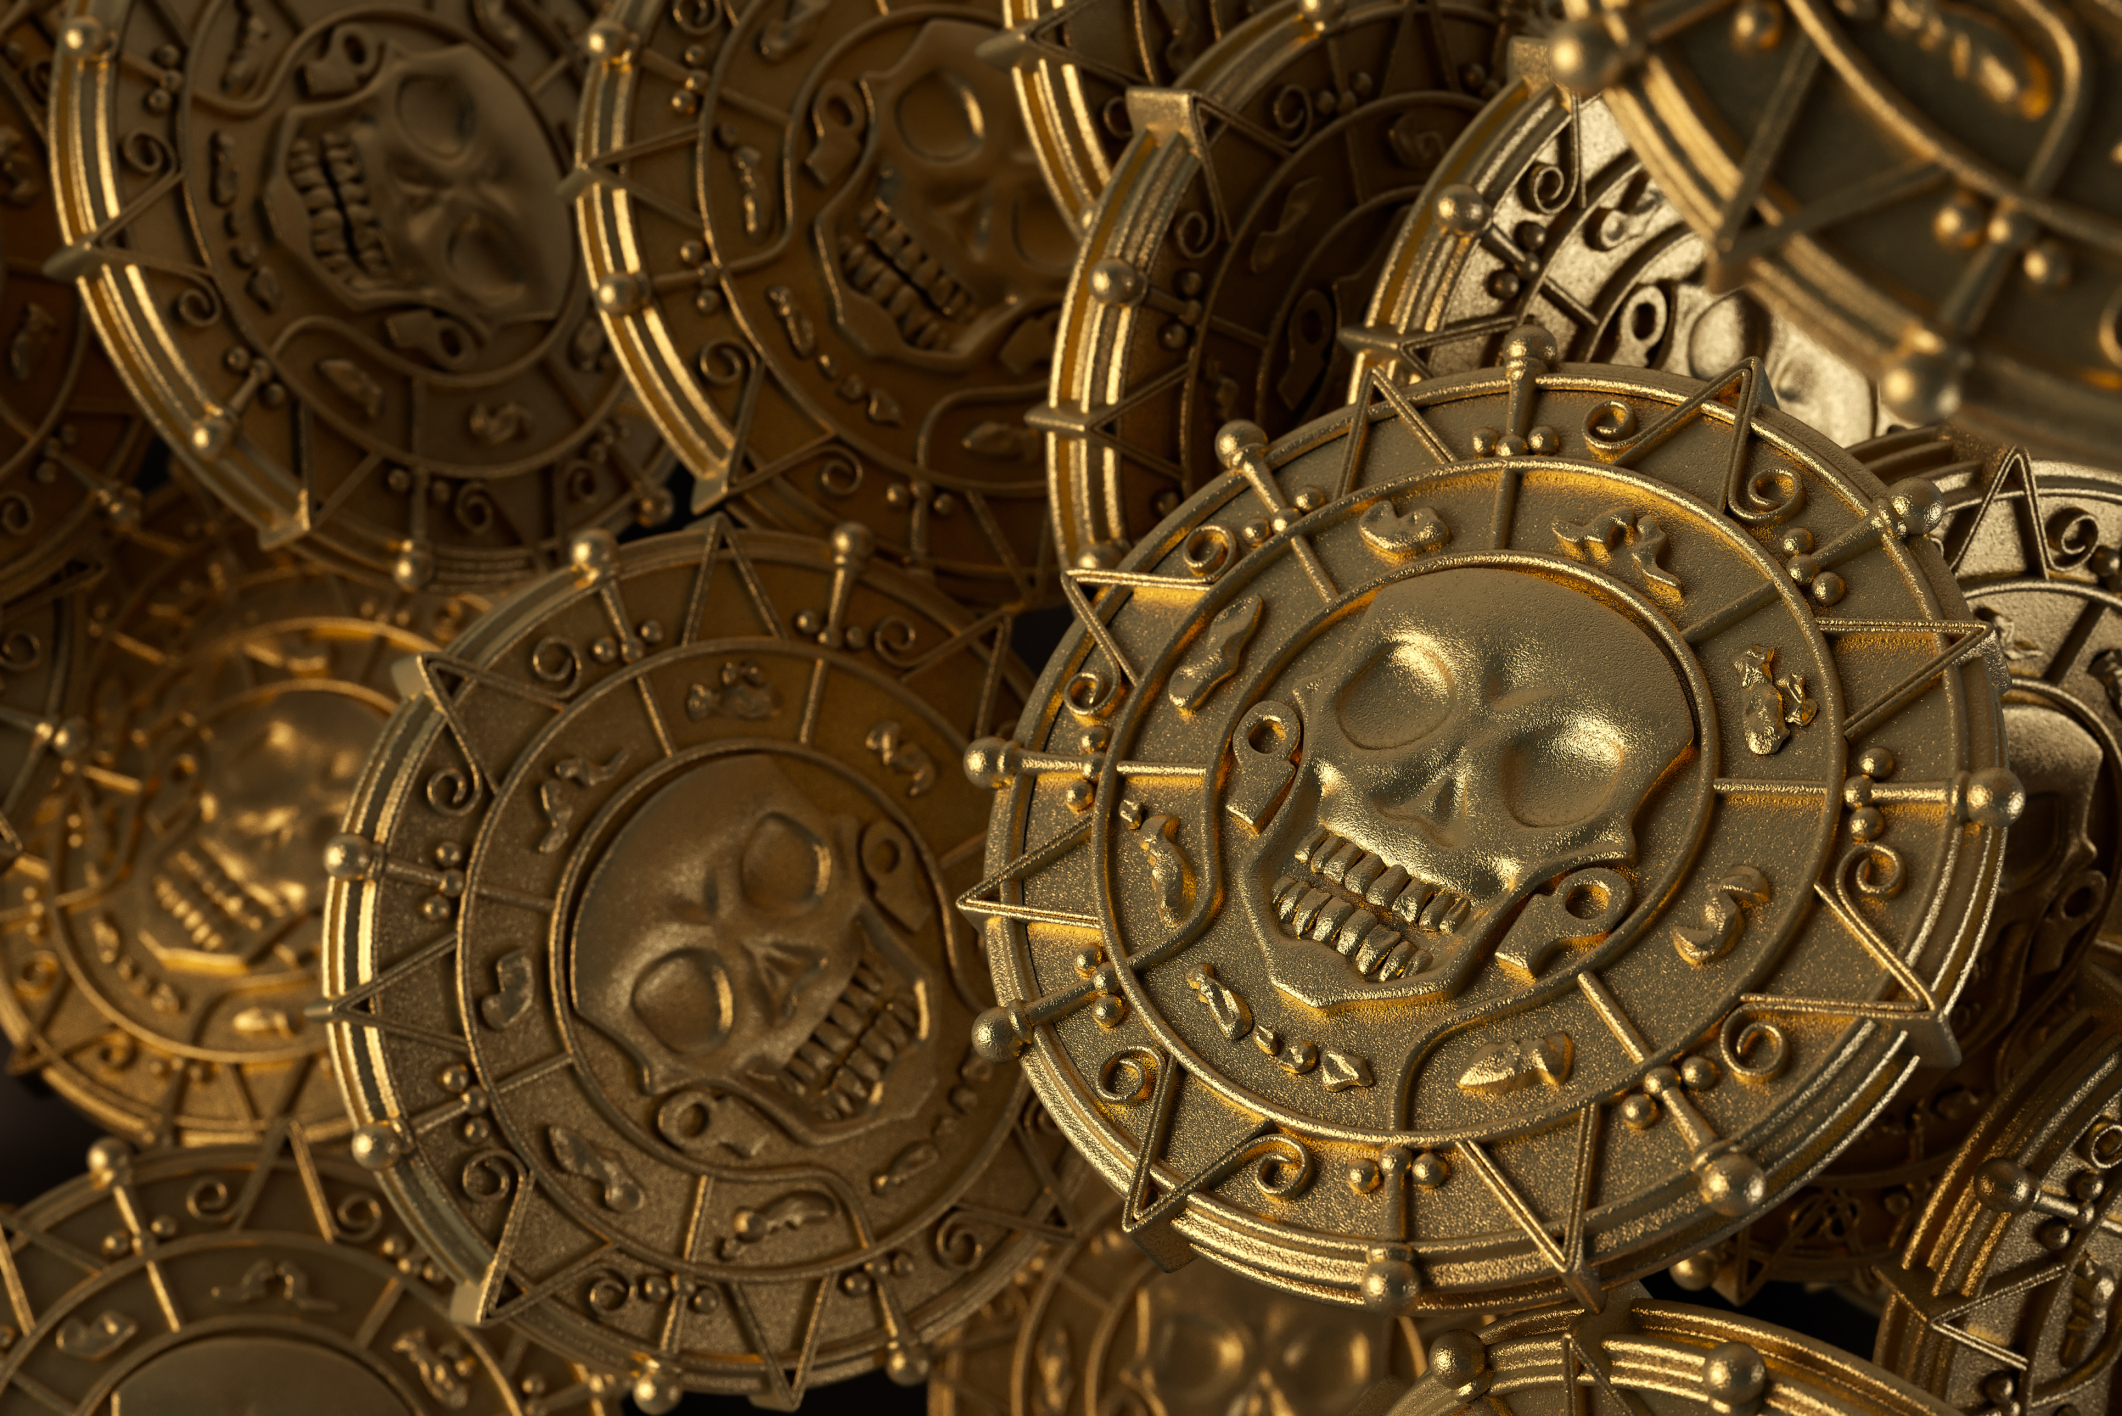 aztec-gold-via-thinkstock